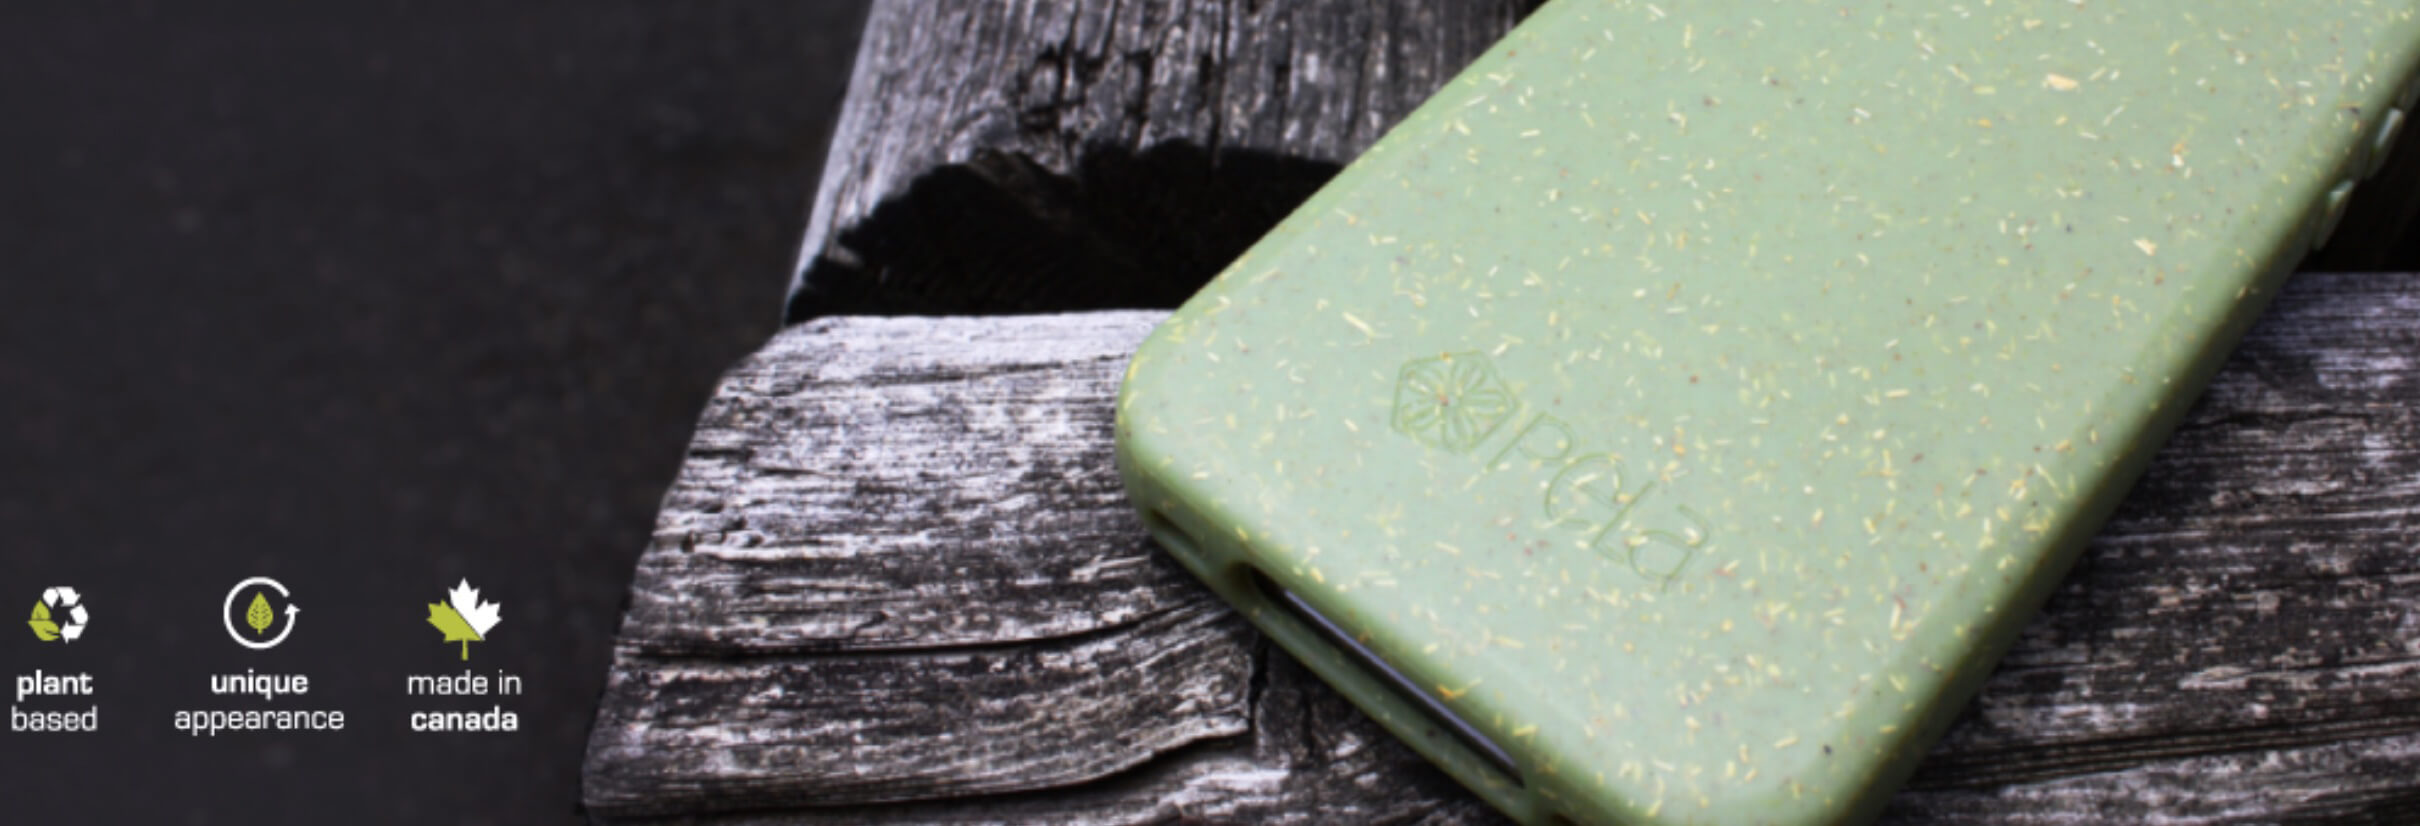 flaxstic-material-pela-case